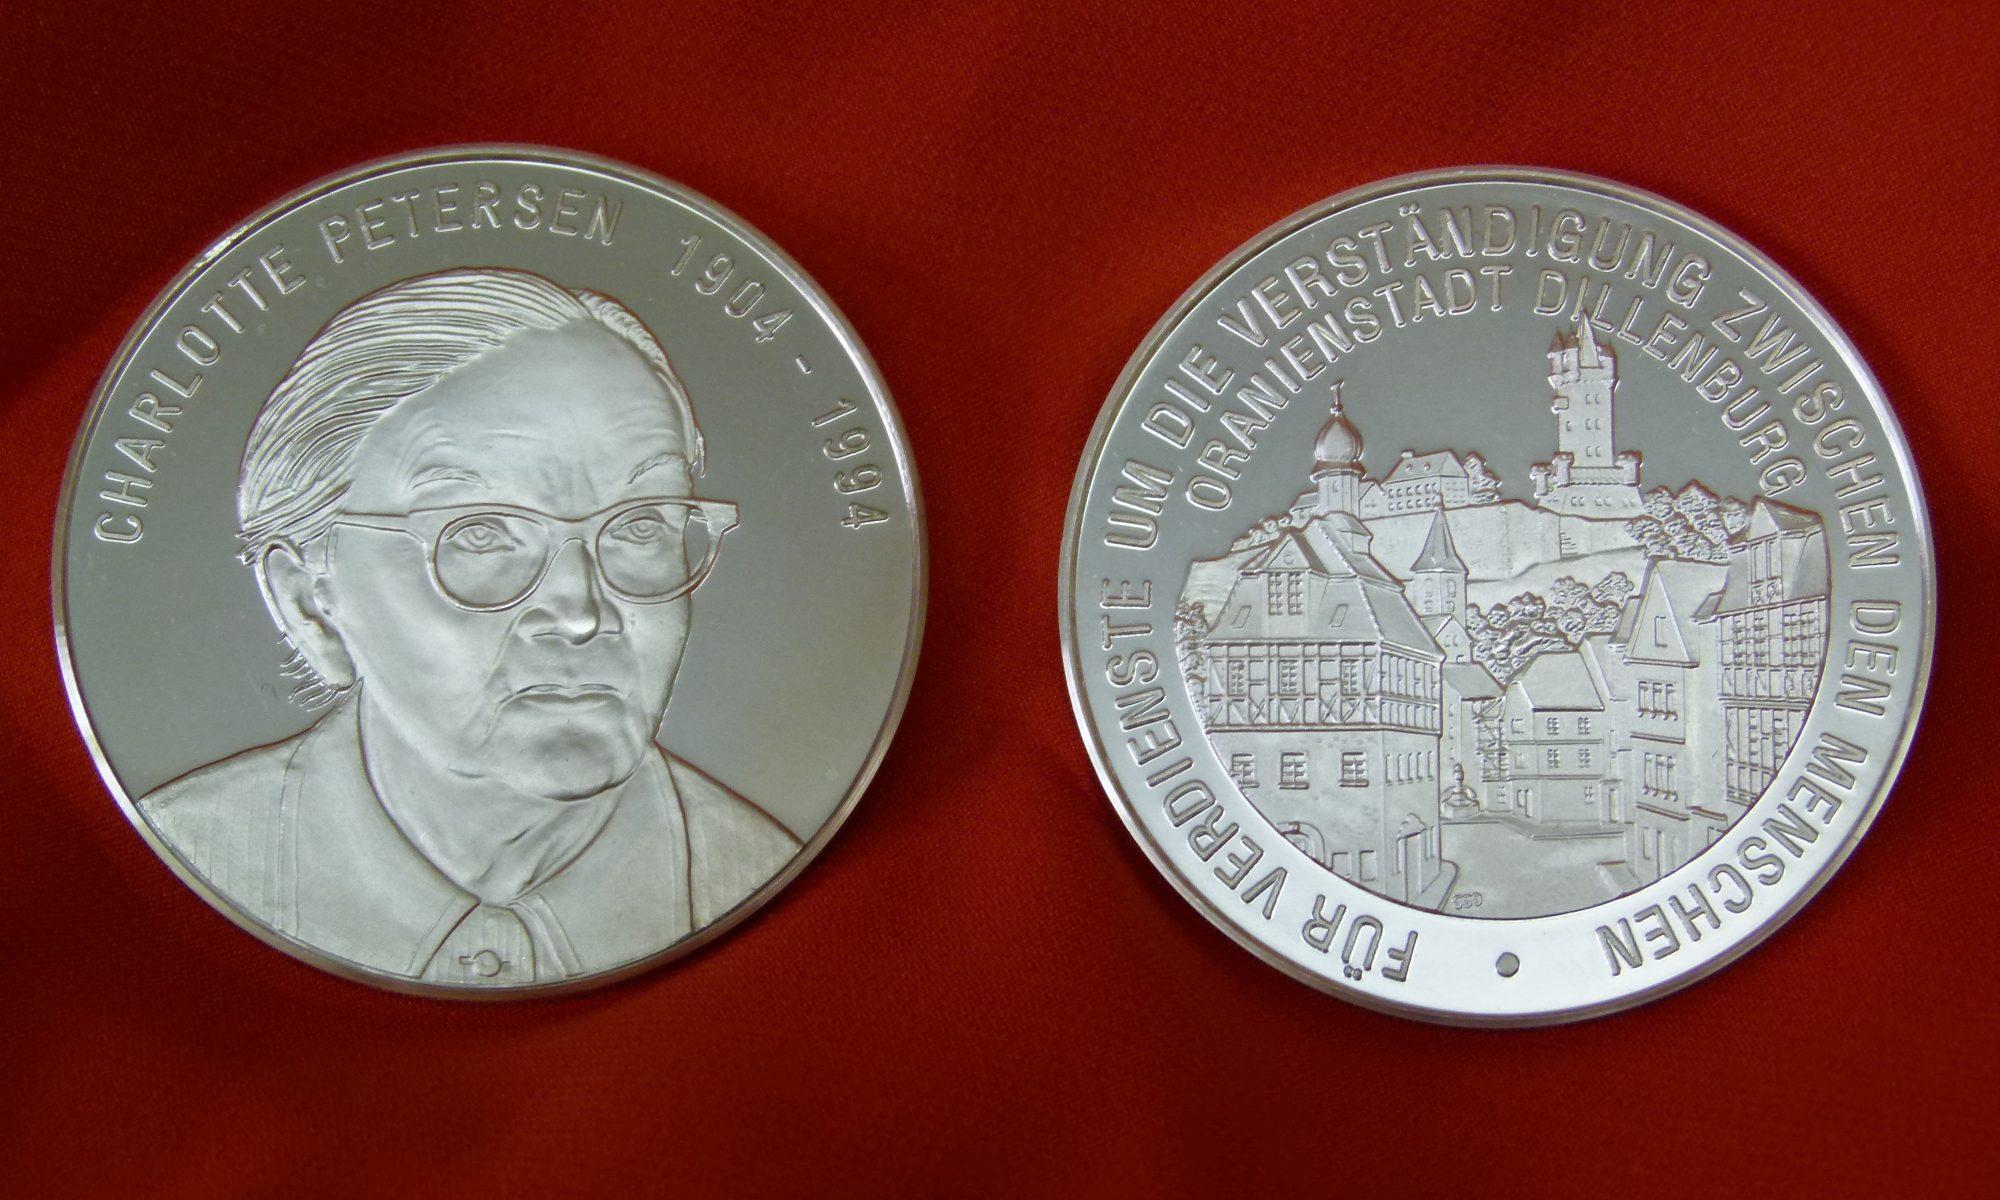 Charlotte-Petersen-Medaille